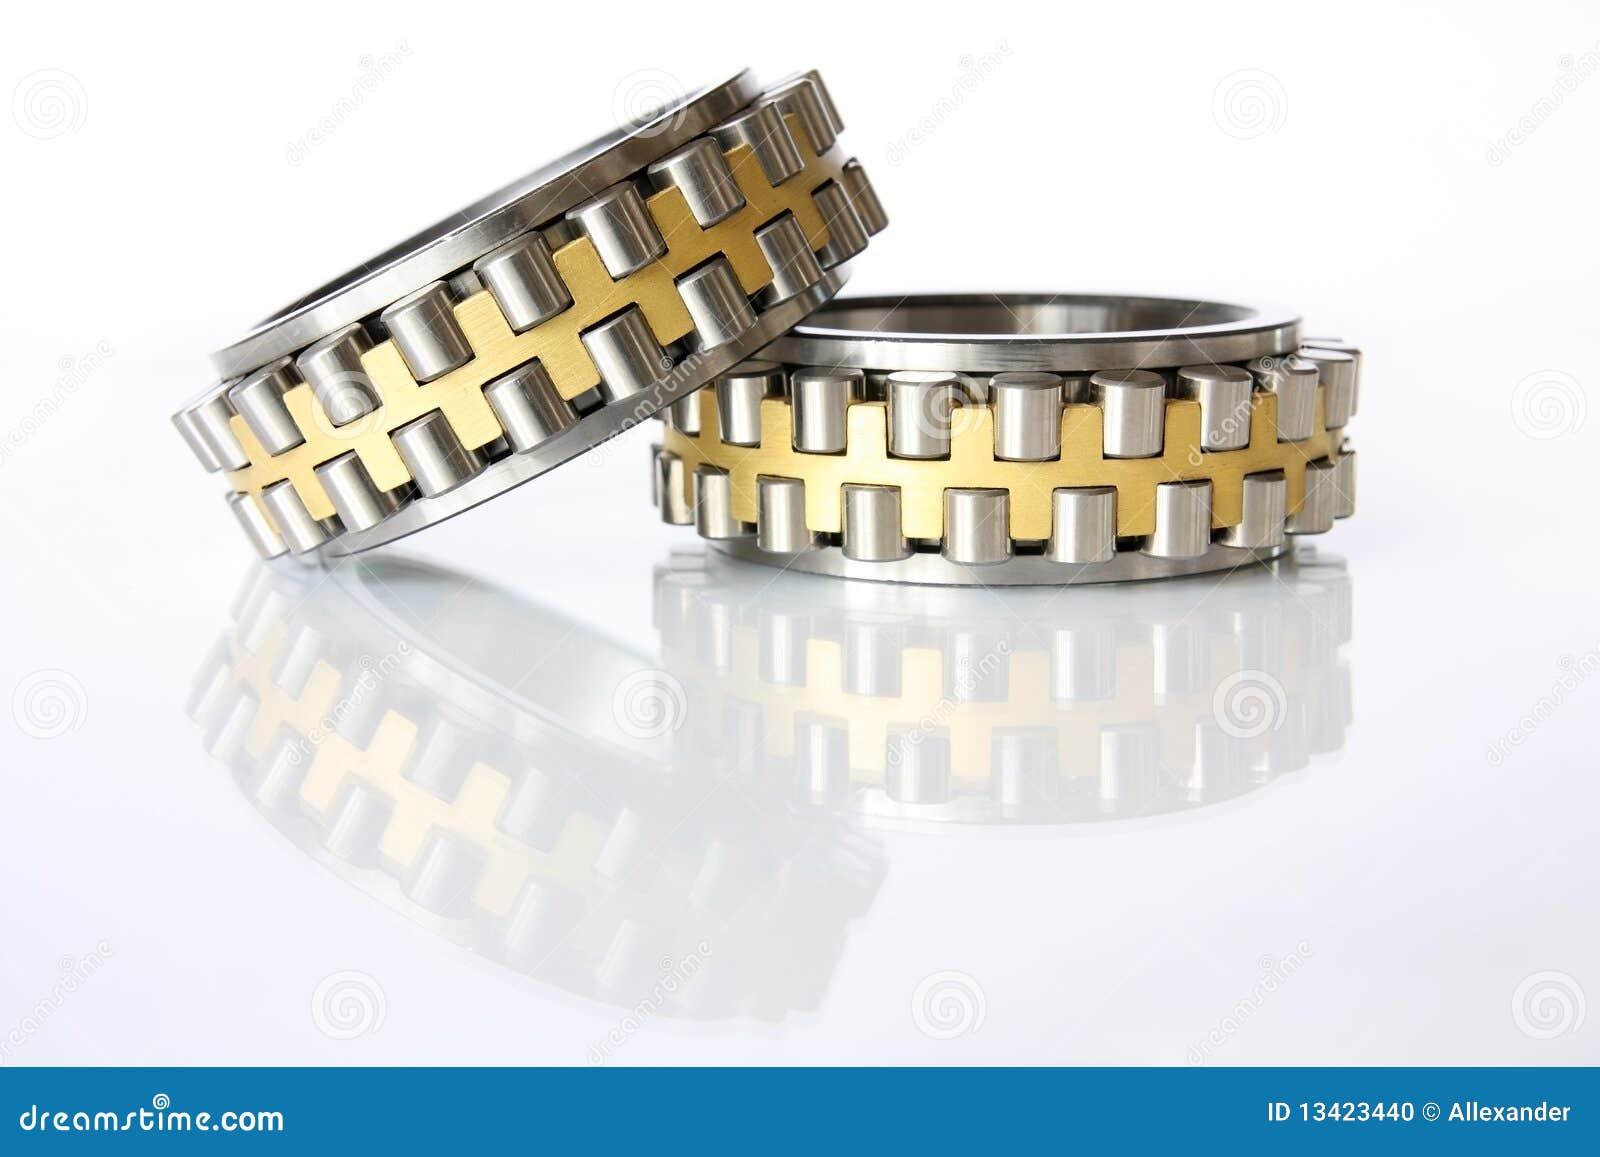 Radial - thrust bearings